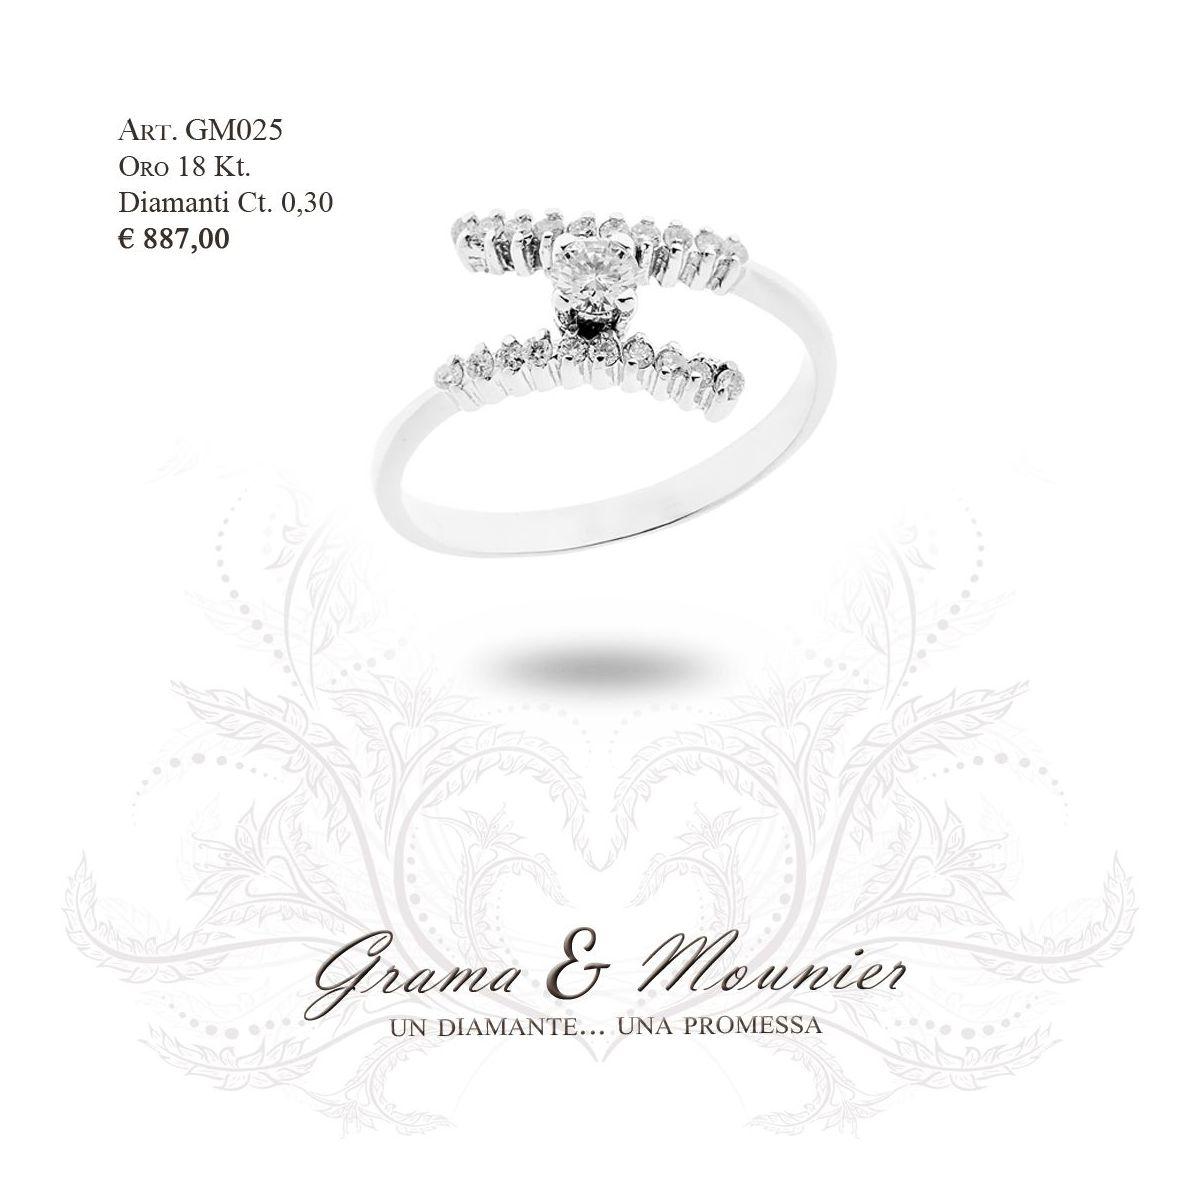 Anello in oro 18Kt Grama&Mounier Art.GM025